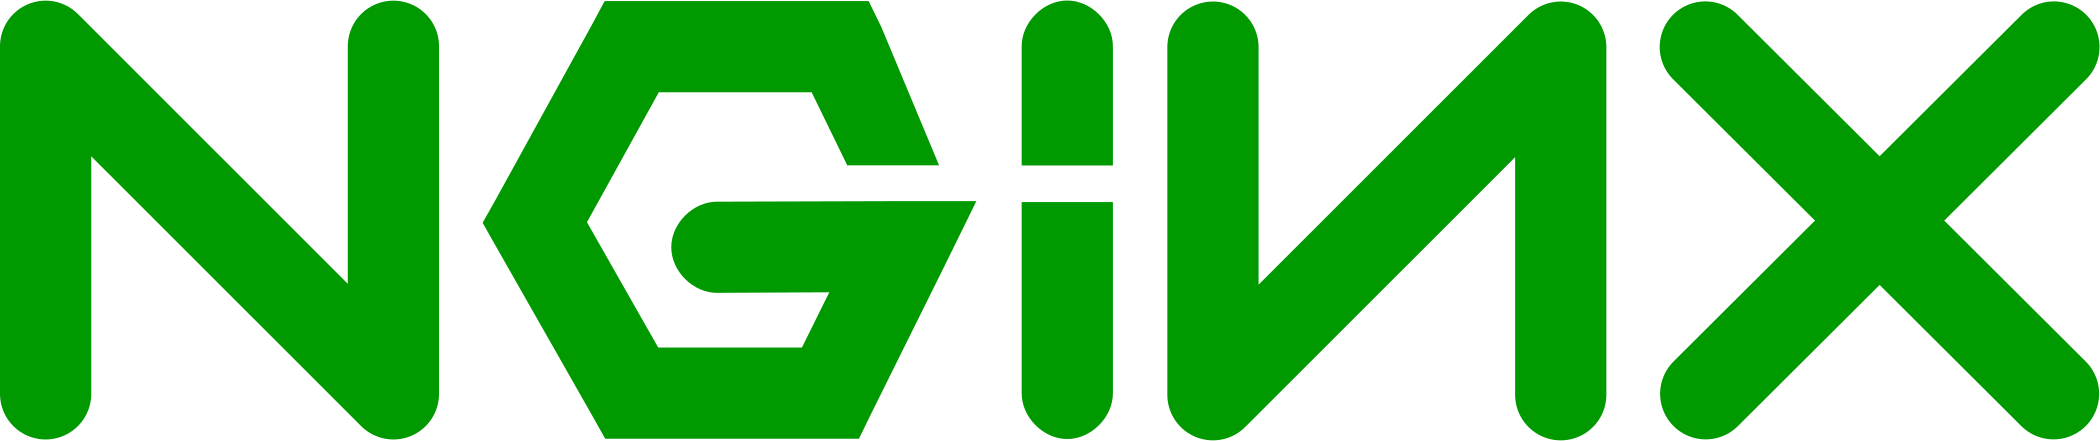 nginx logo 2 - Nginx Logo